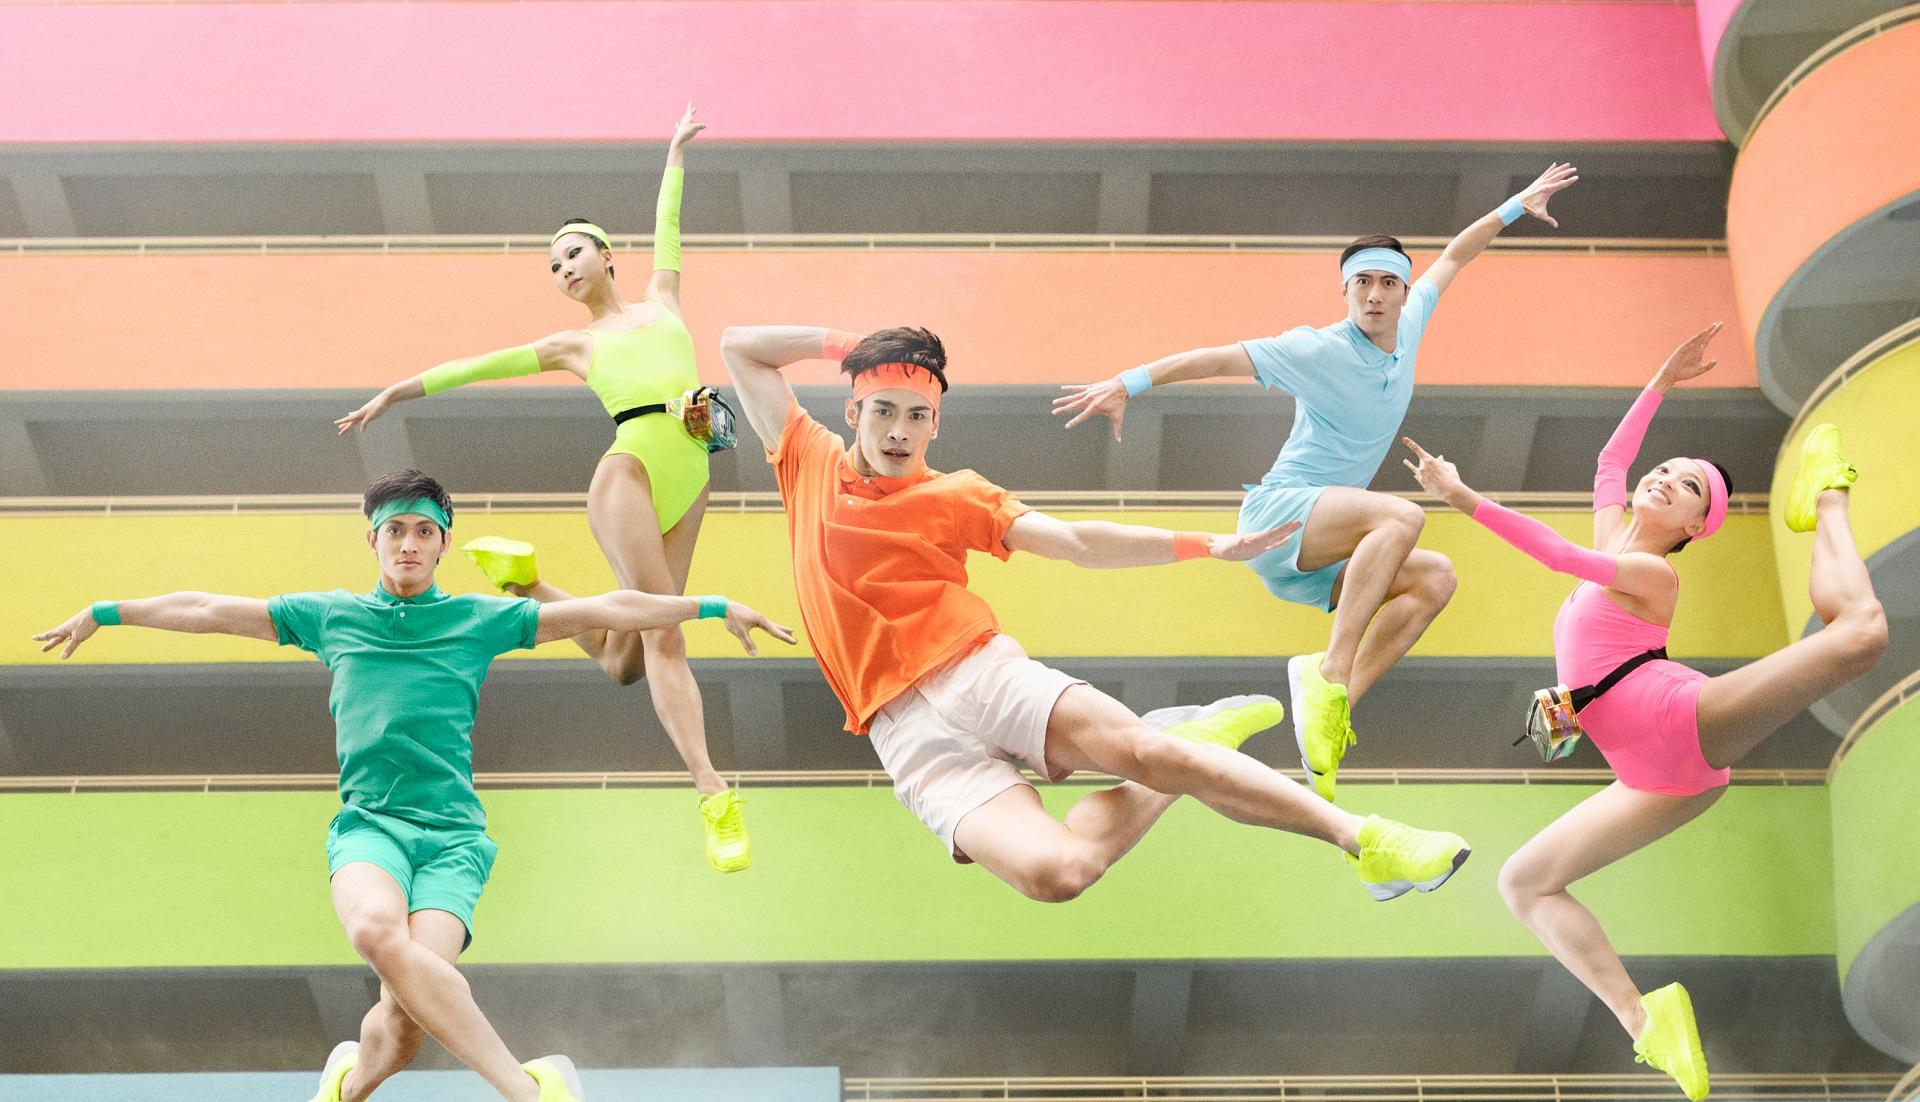 Hong Kong Ballet film by Design Army